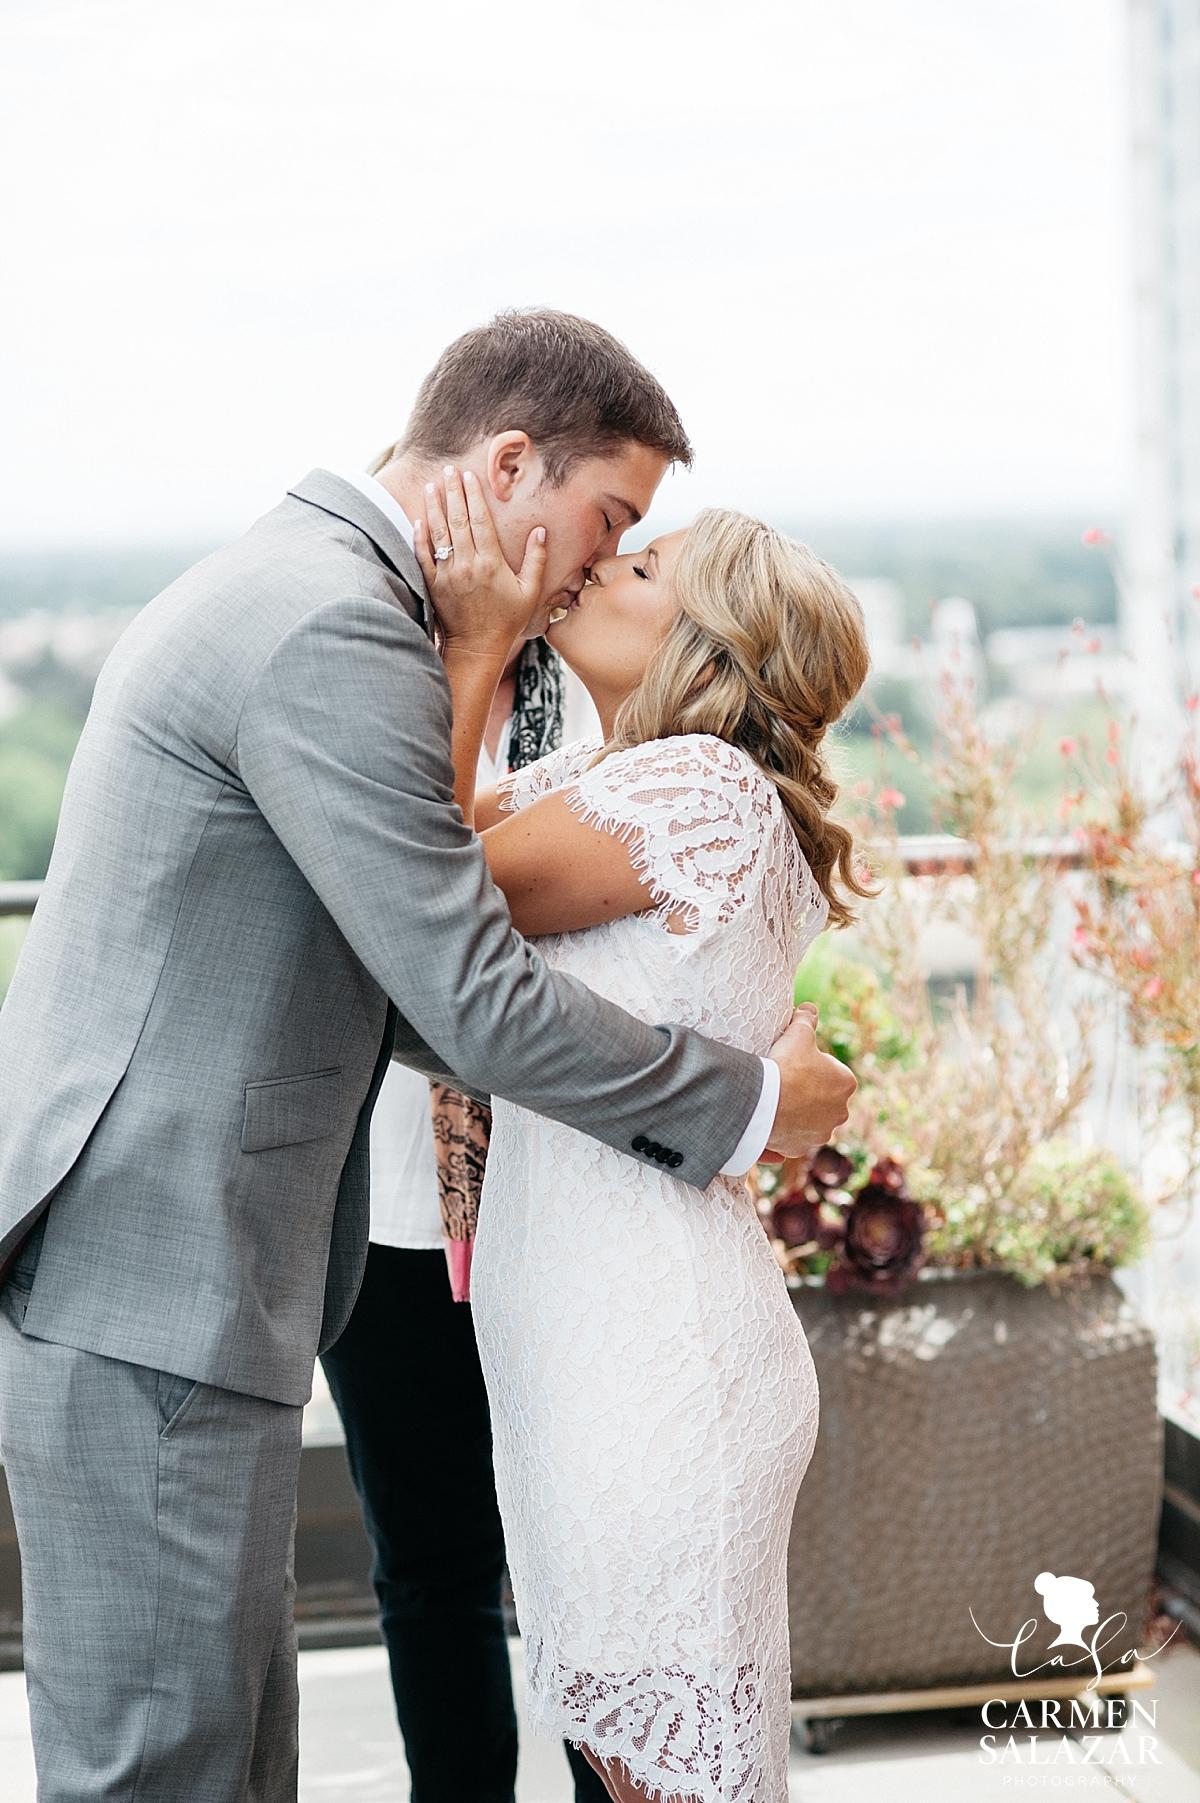 First kiss on The Citizen penthouse balcony - Carmen Salazar